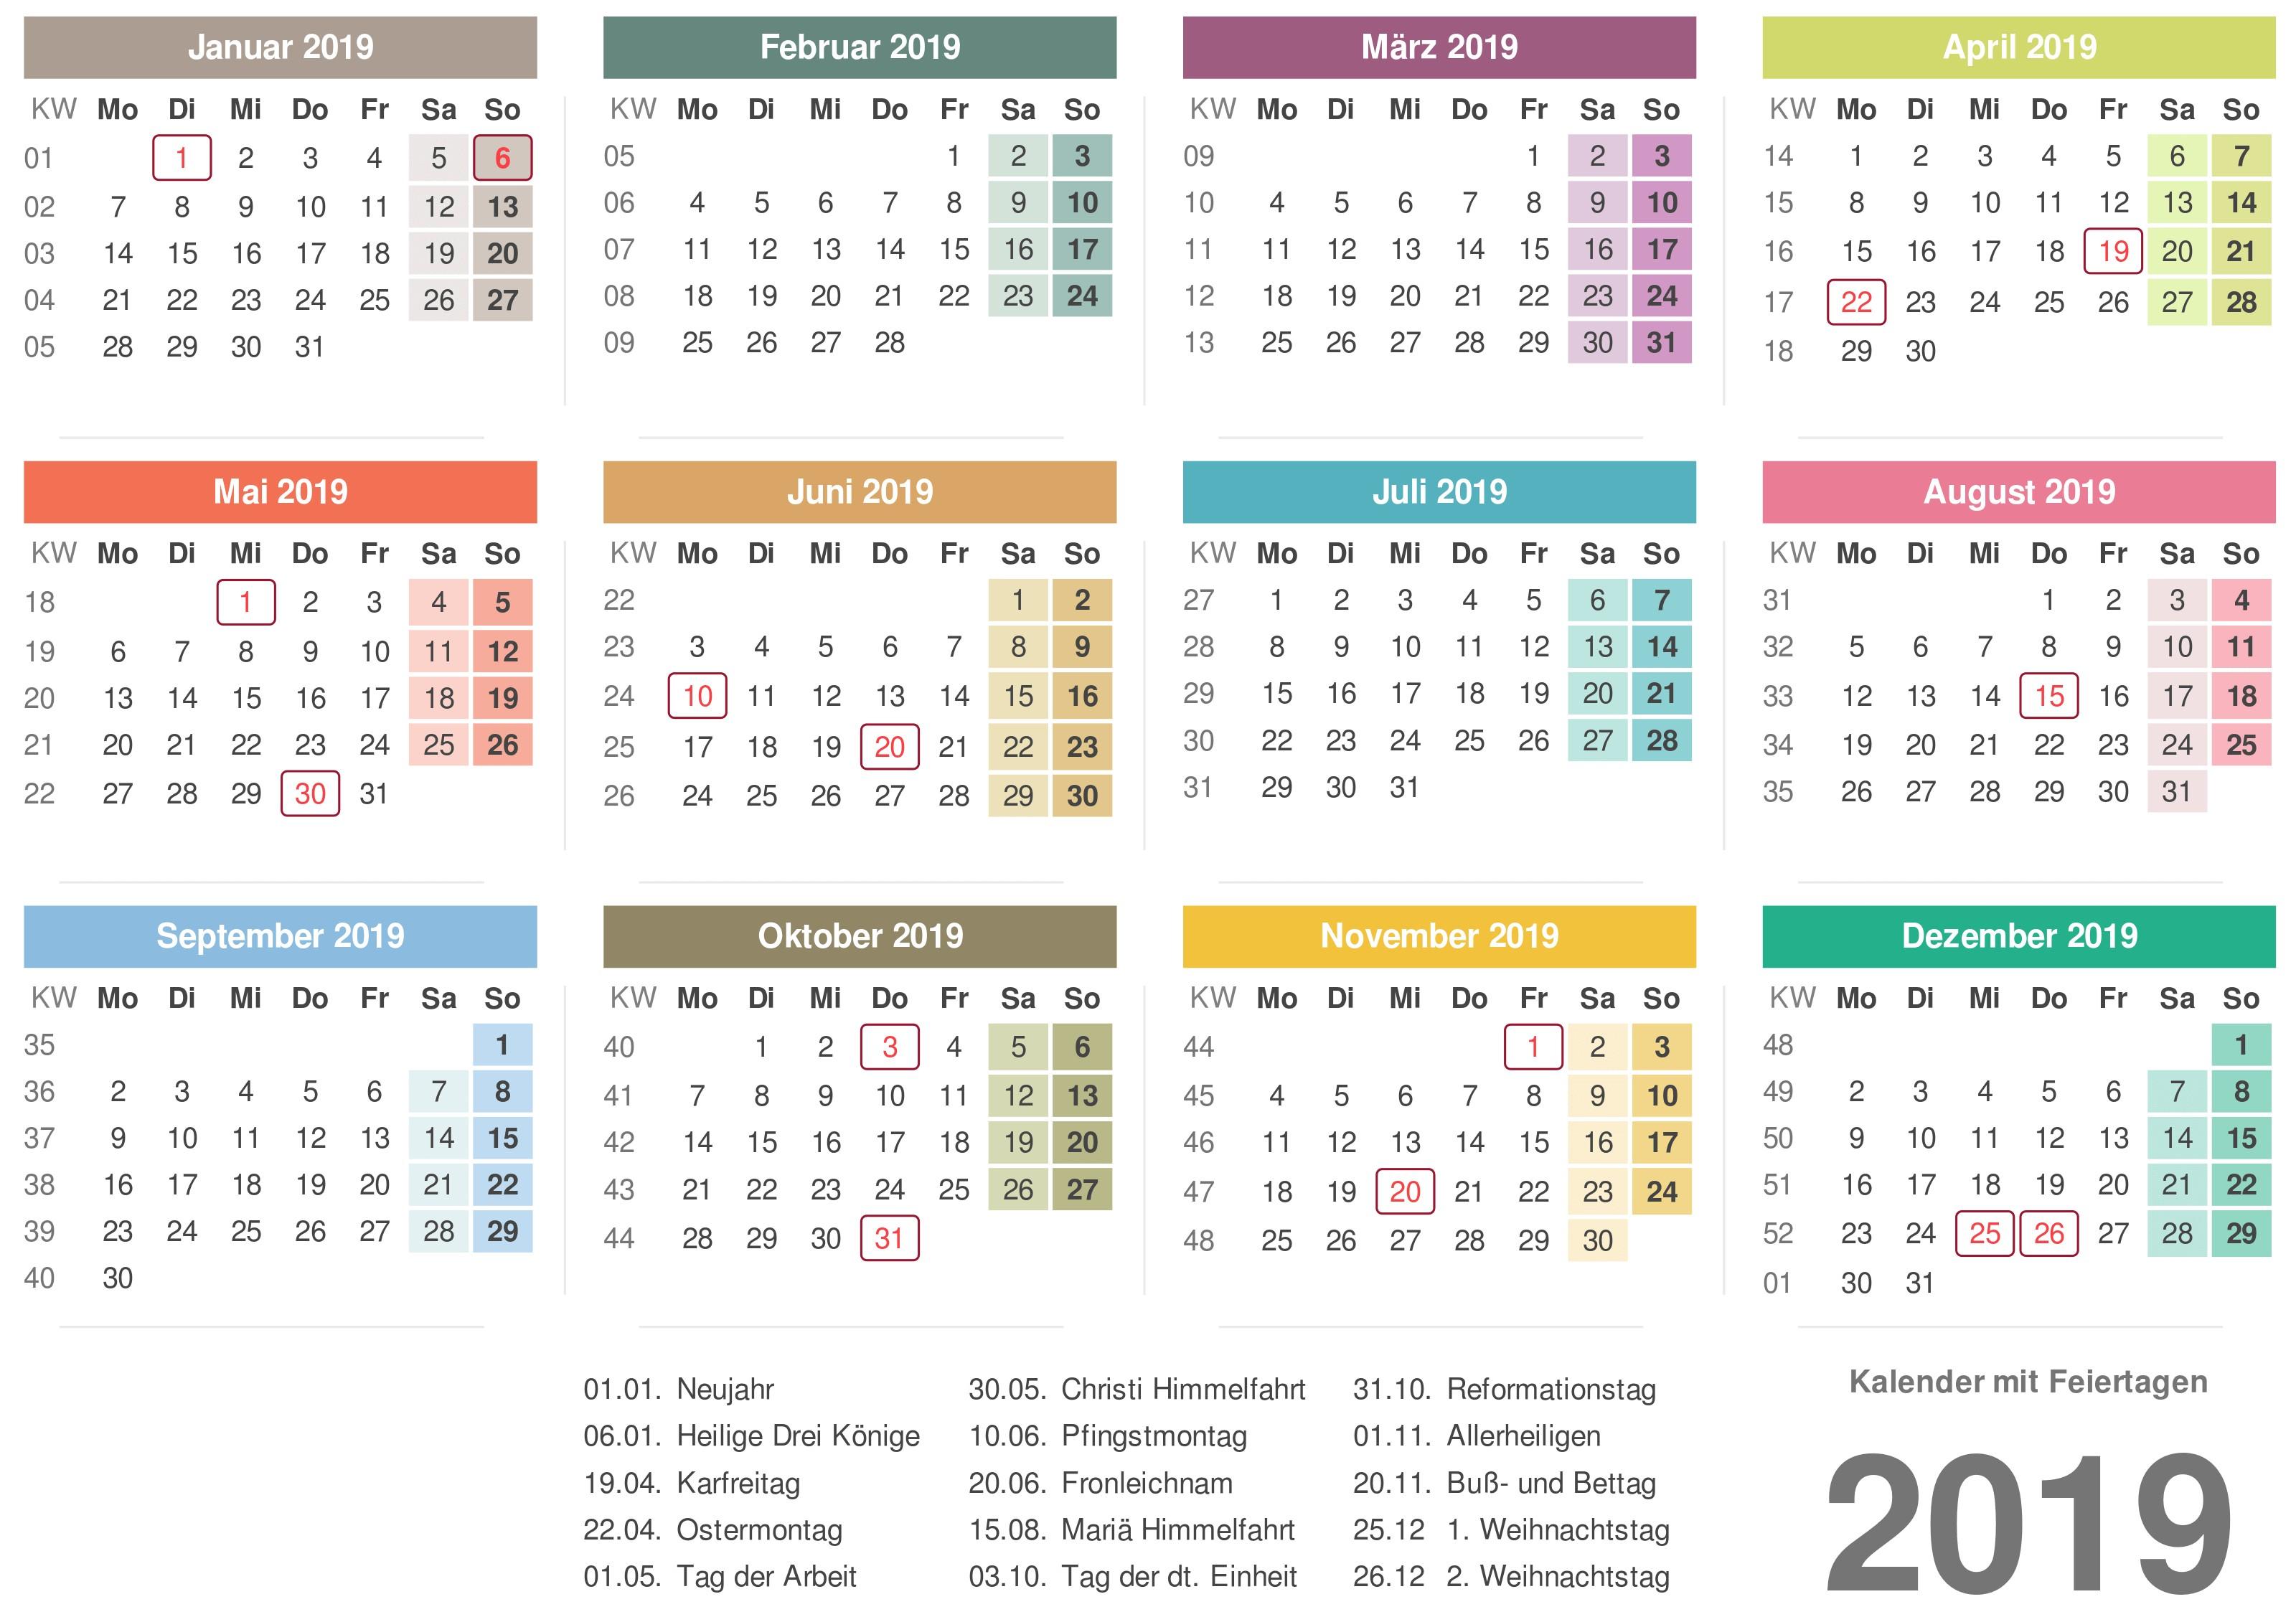 Kalender 2019 Masehi Más Recientemente Liberado Kalender 2019 Infoagrarfuchss Webseite Vinpearl Baidaifo